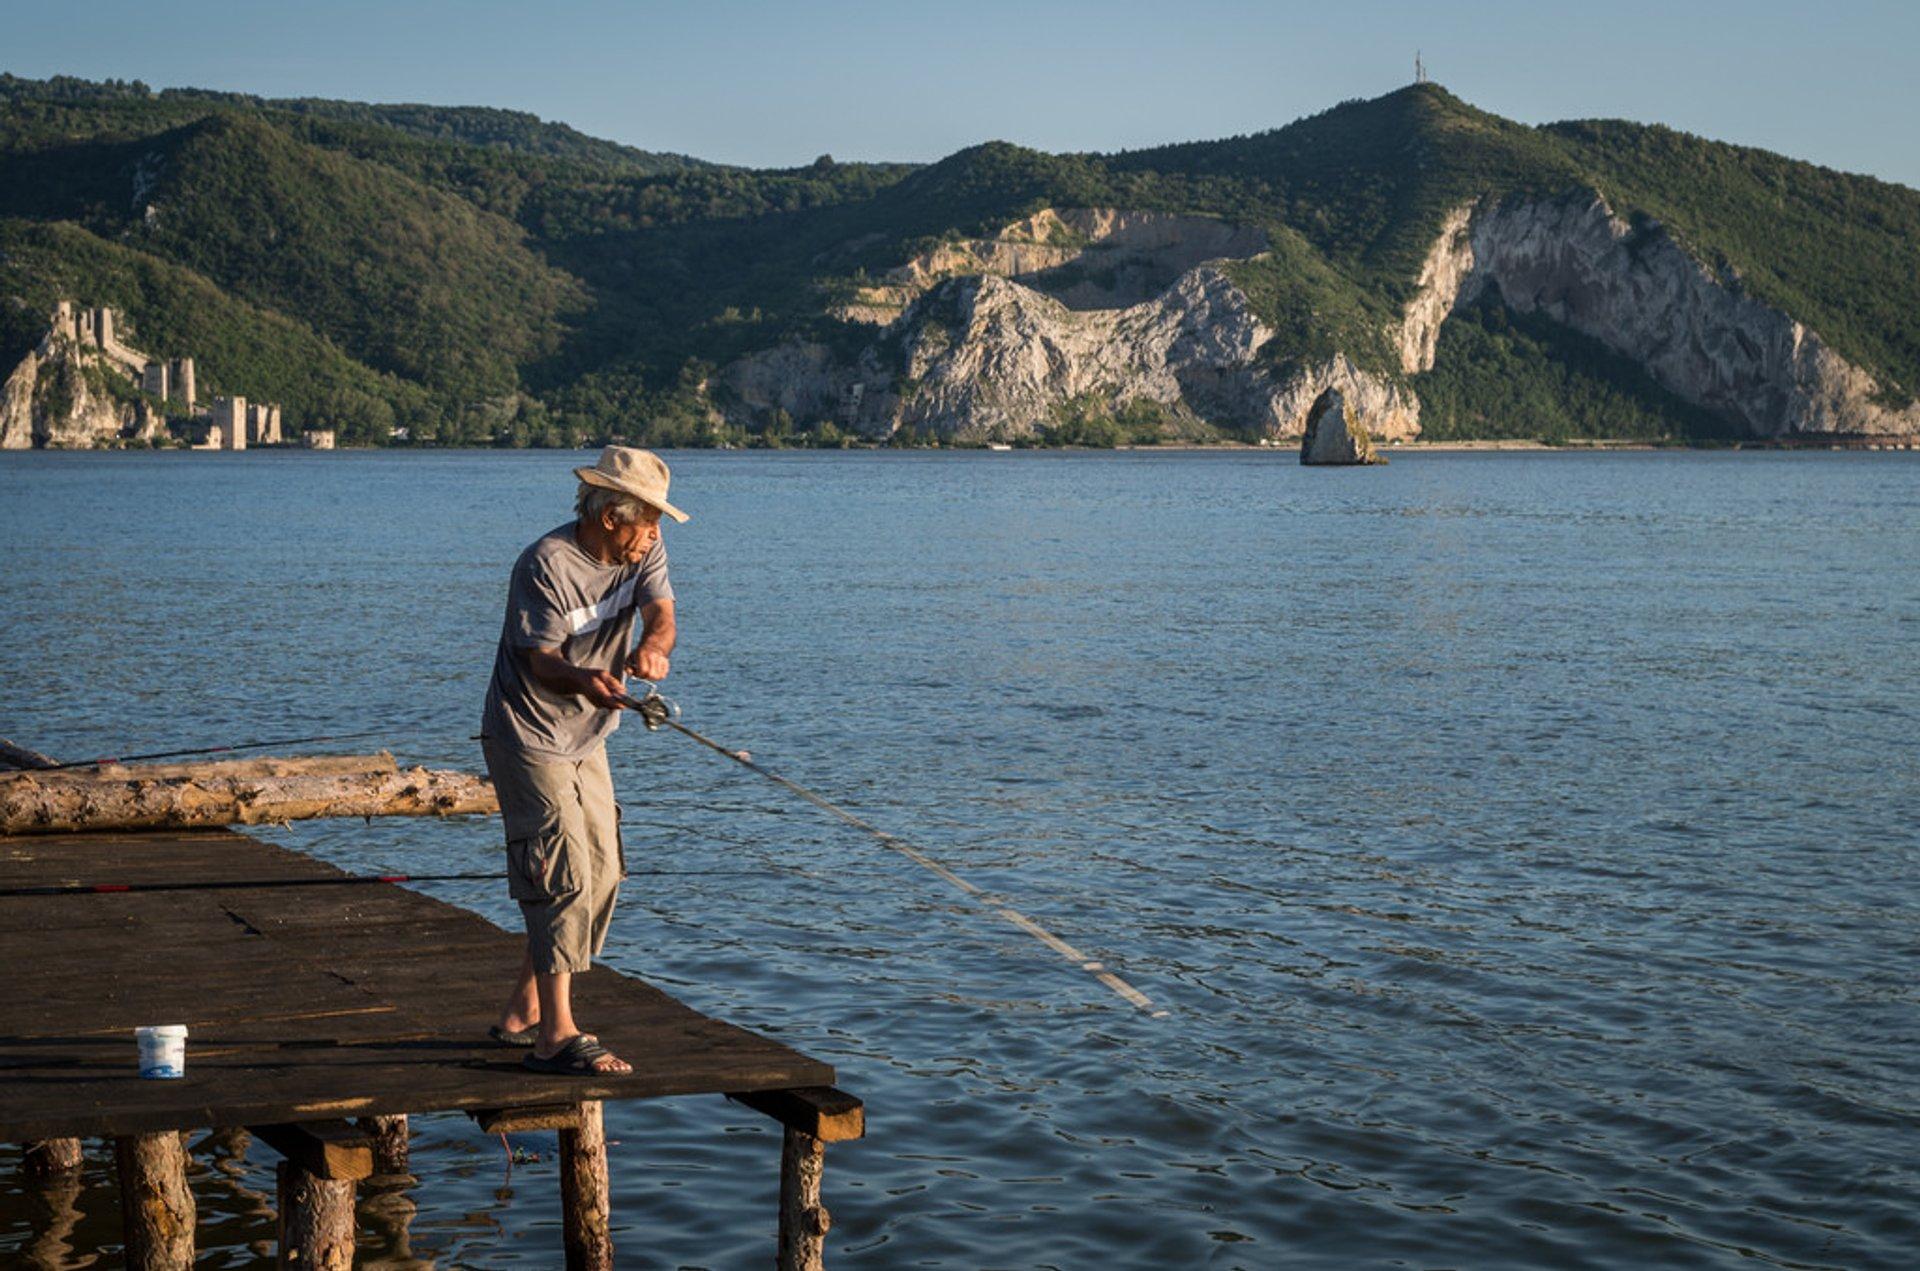 Сatfish Fishing Season in Romania 2019 - Best Time